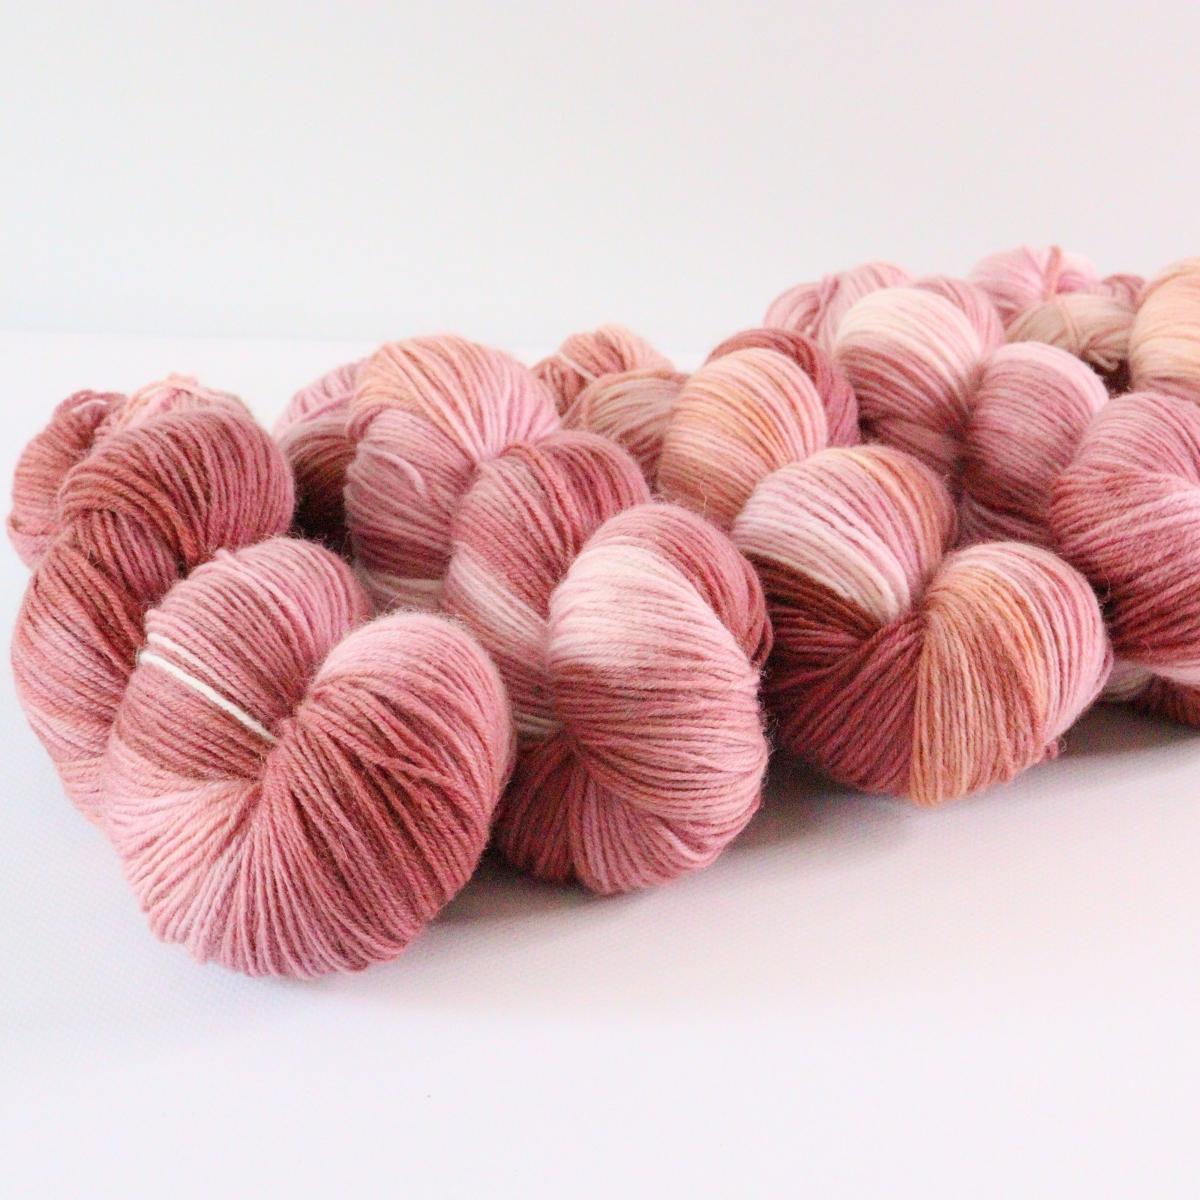 woodico.pro hand dyed yarn 075 1 1200x1200 - Hand dyed yarn / 075